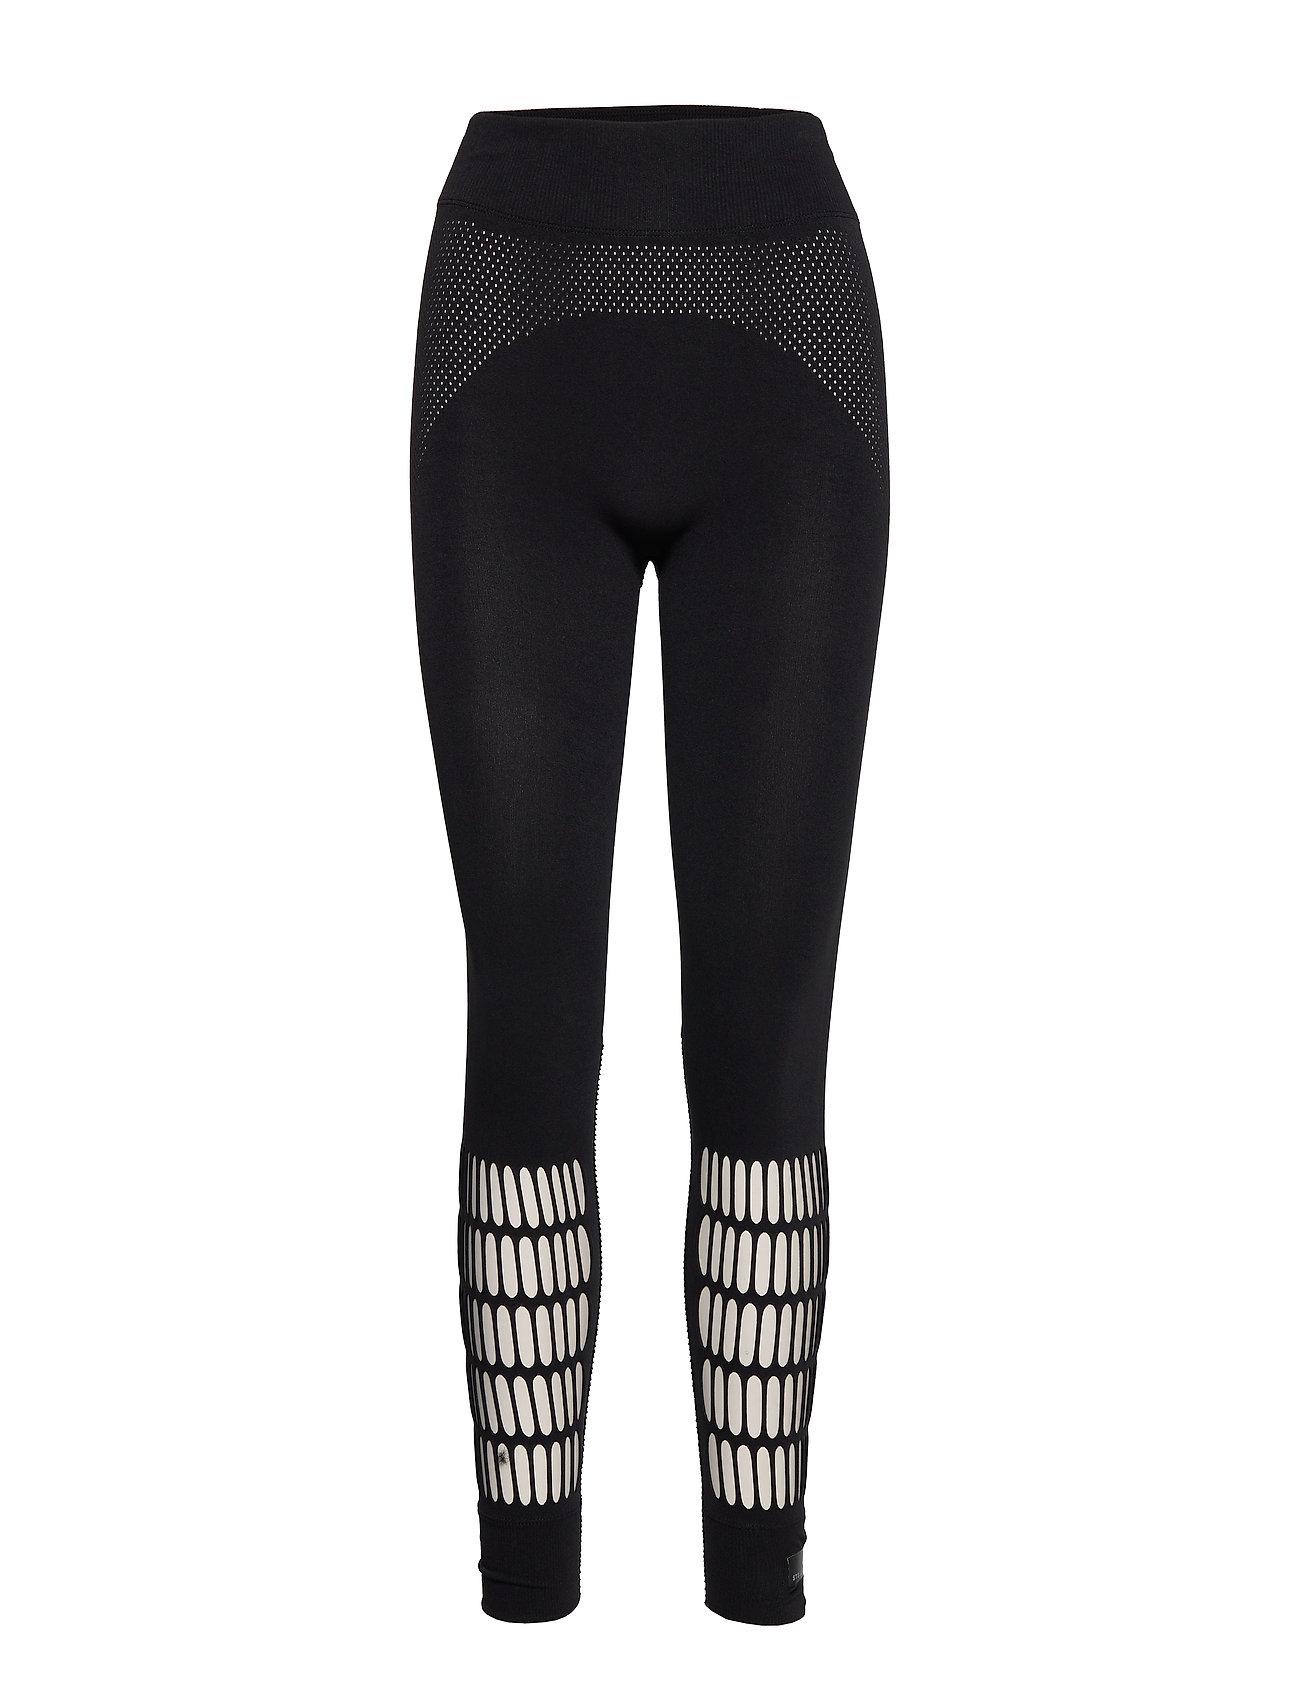 adidas by Stella McCartney WARP KNIT TIGHT - BLACK